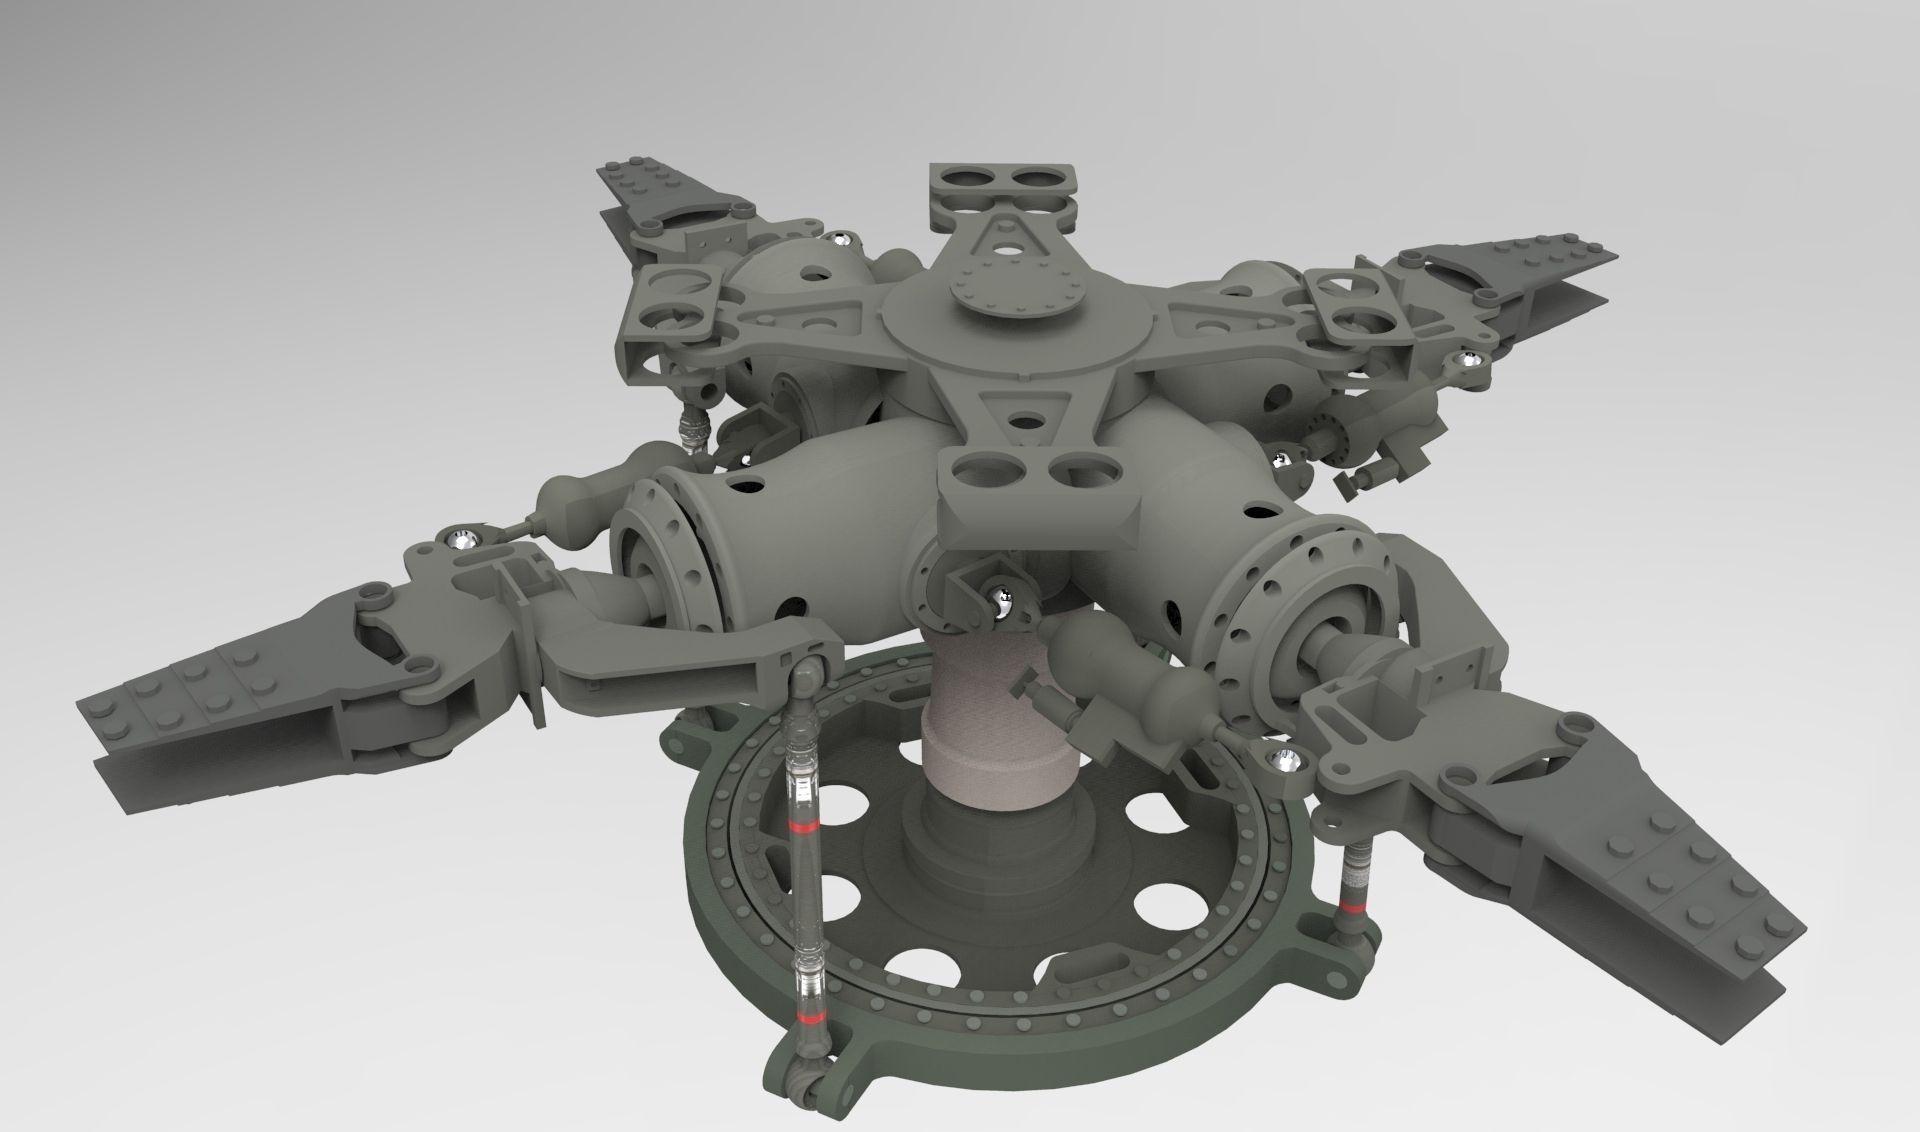 Uh 60 Black Hawk Main Rotor Head Free 3d Model Sldprt